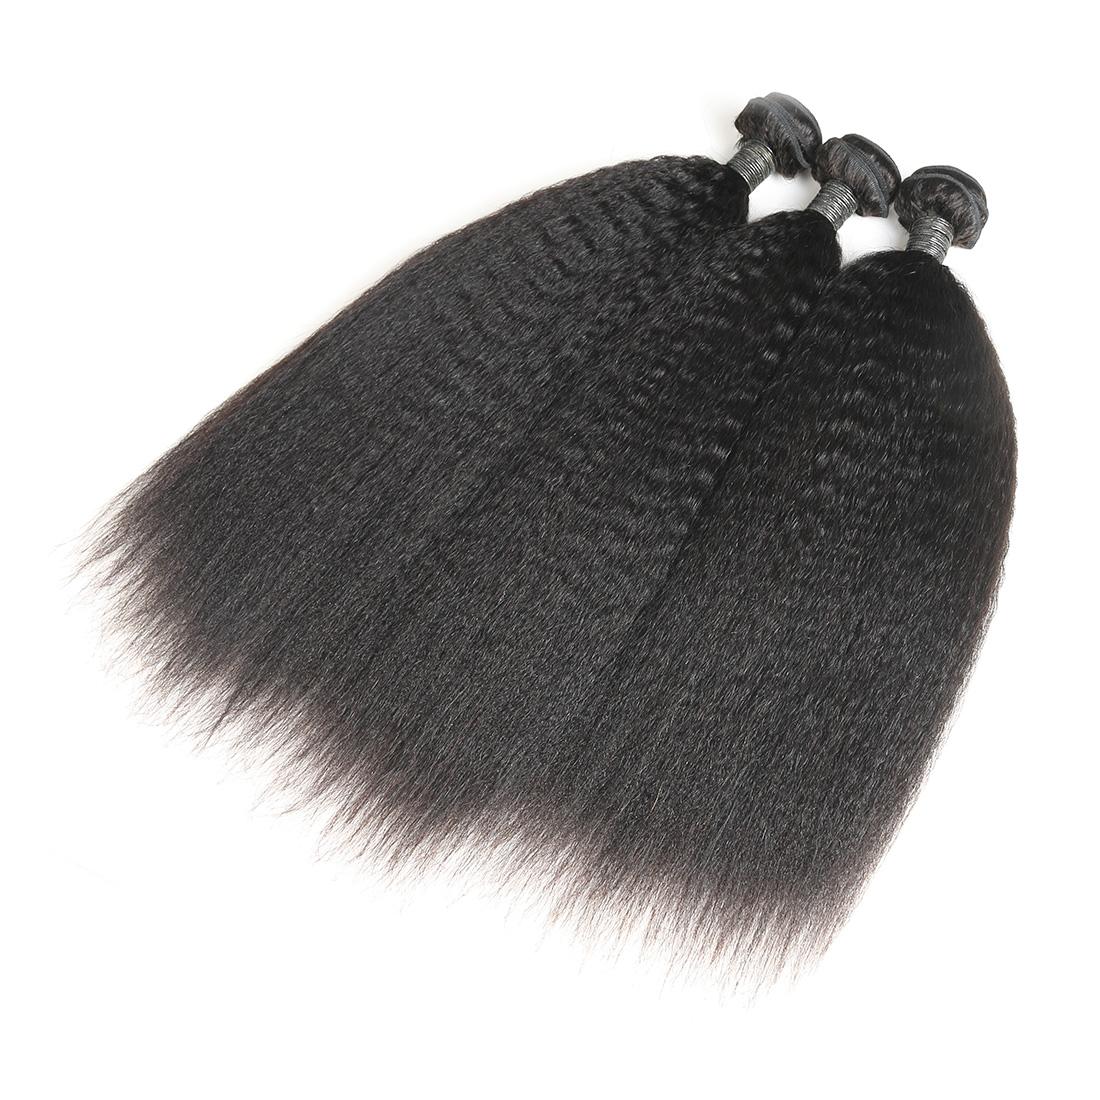 8A Brazilian Kinky Straight 3 Bundles Human Virgin Hair Weave